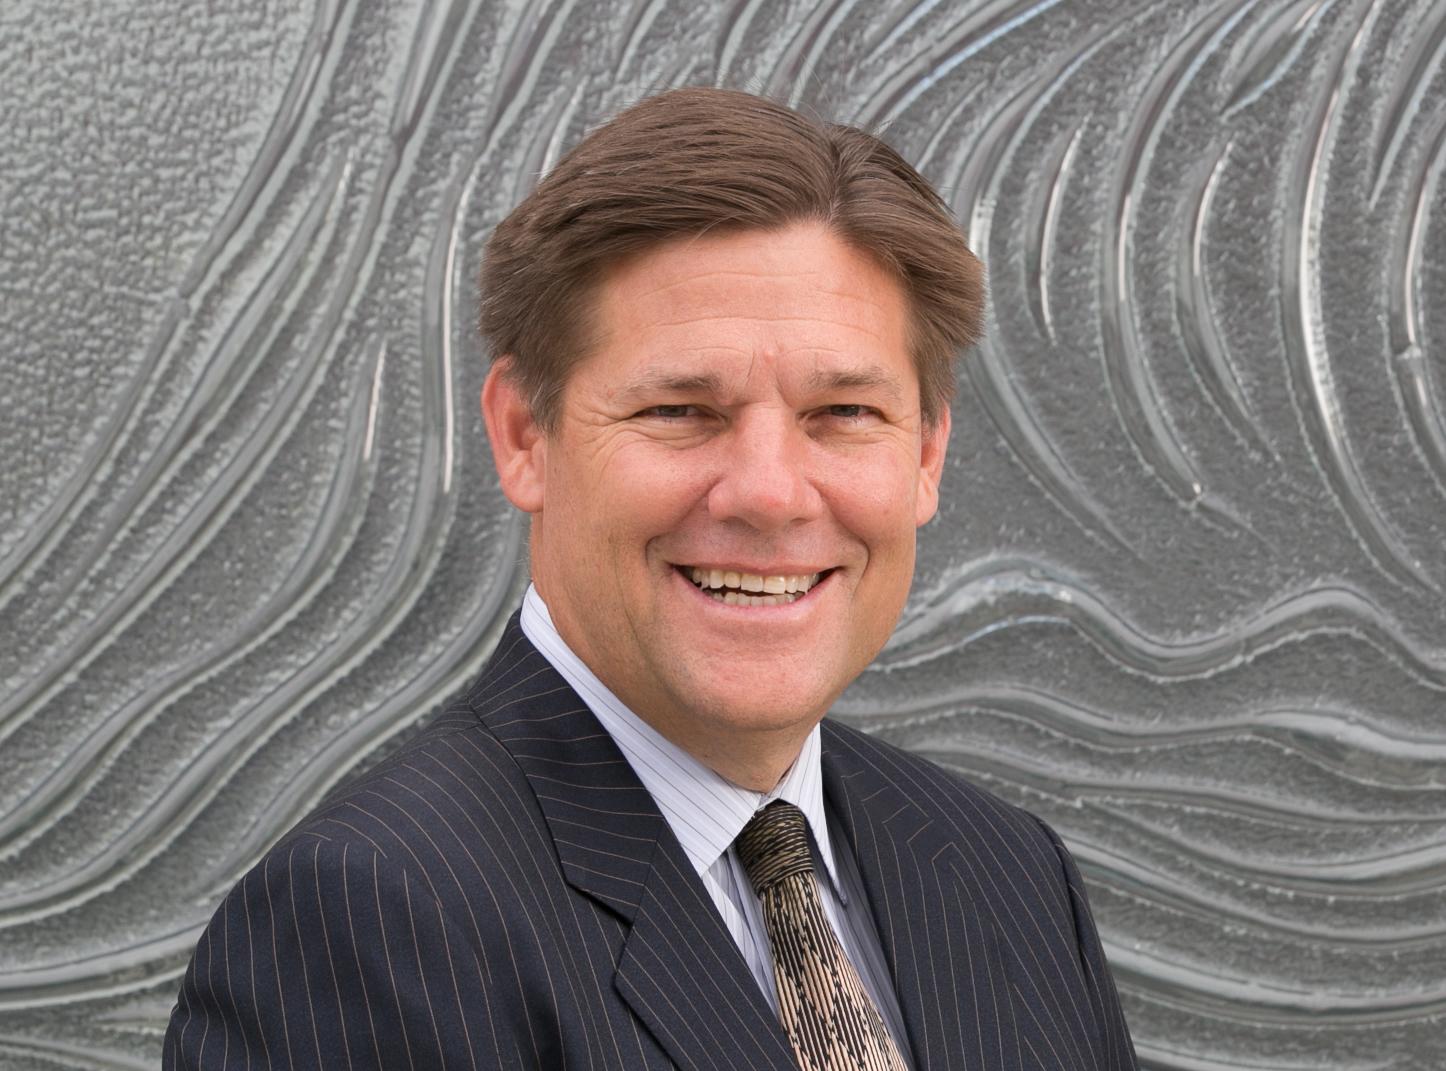 Albro L. Lundy III, Mediator